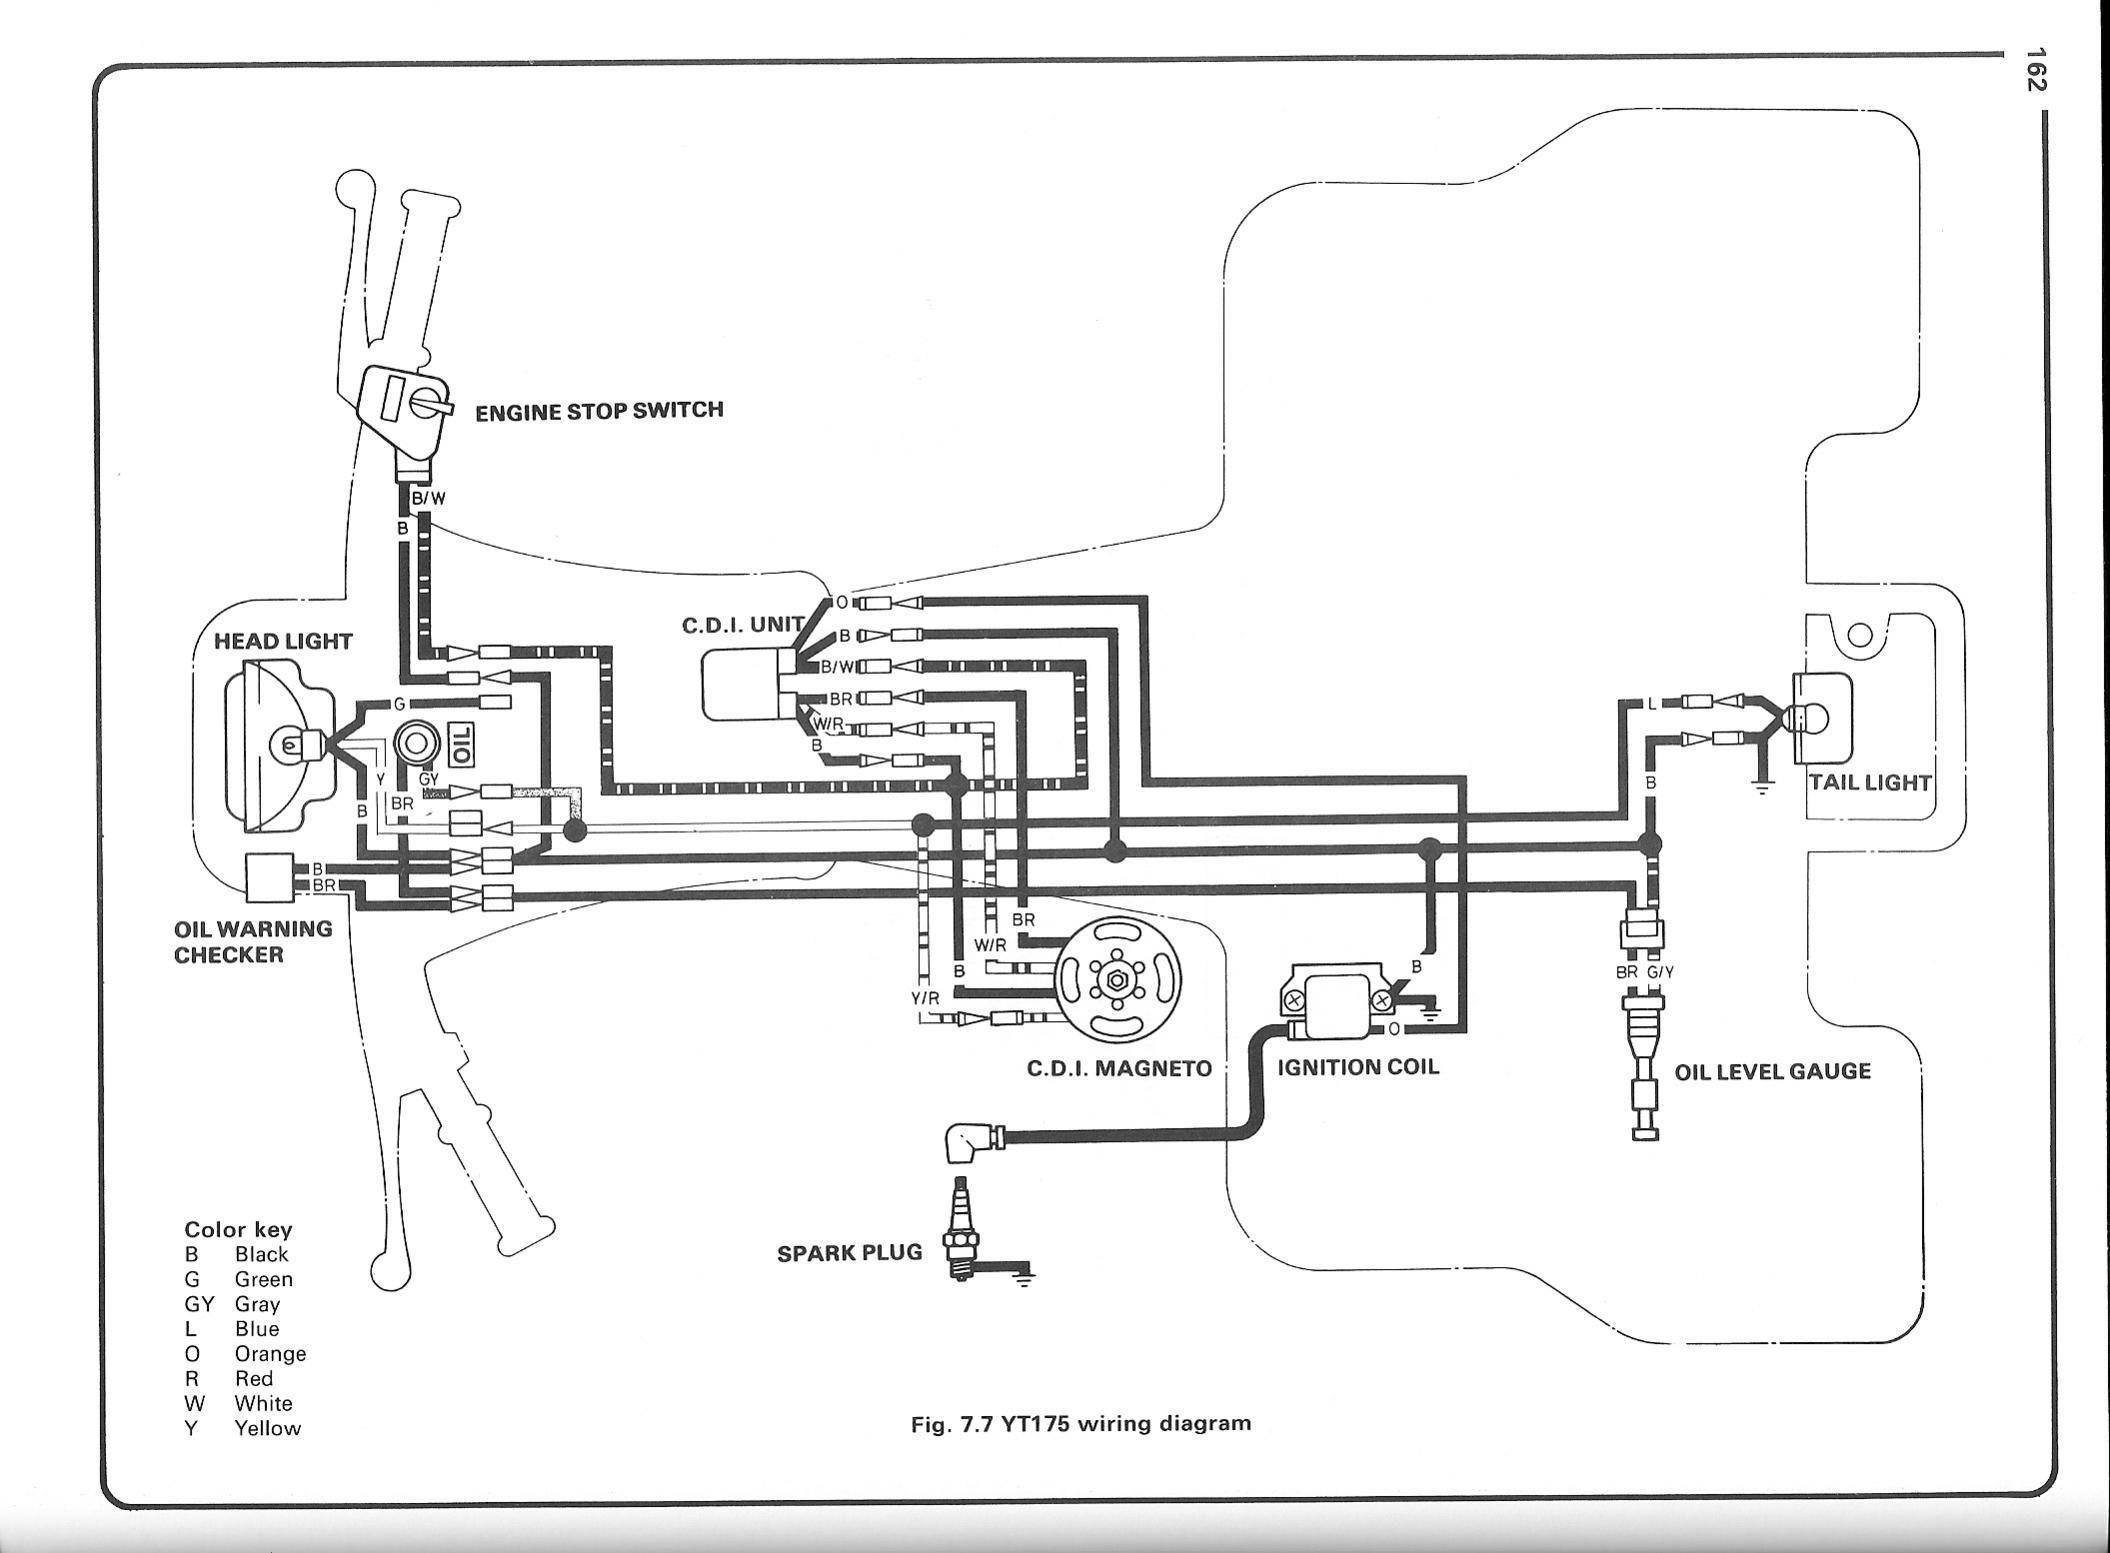 1987 Polaris Trail Boss 250 Wiring Diagram in 2020